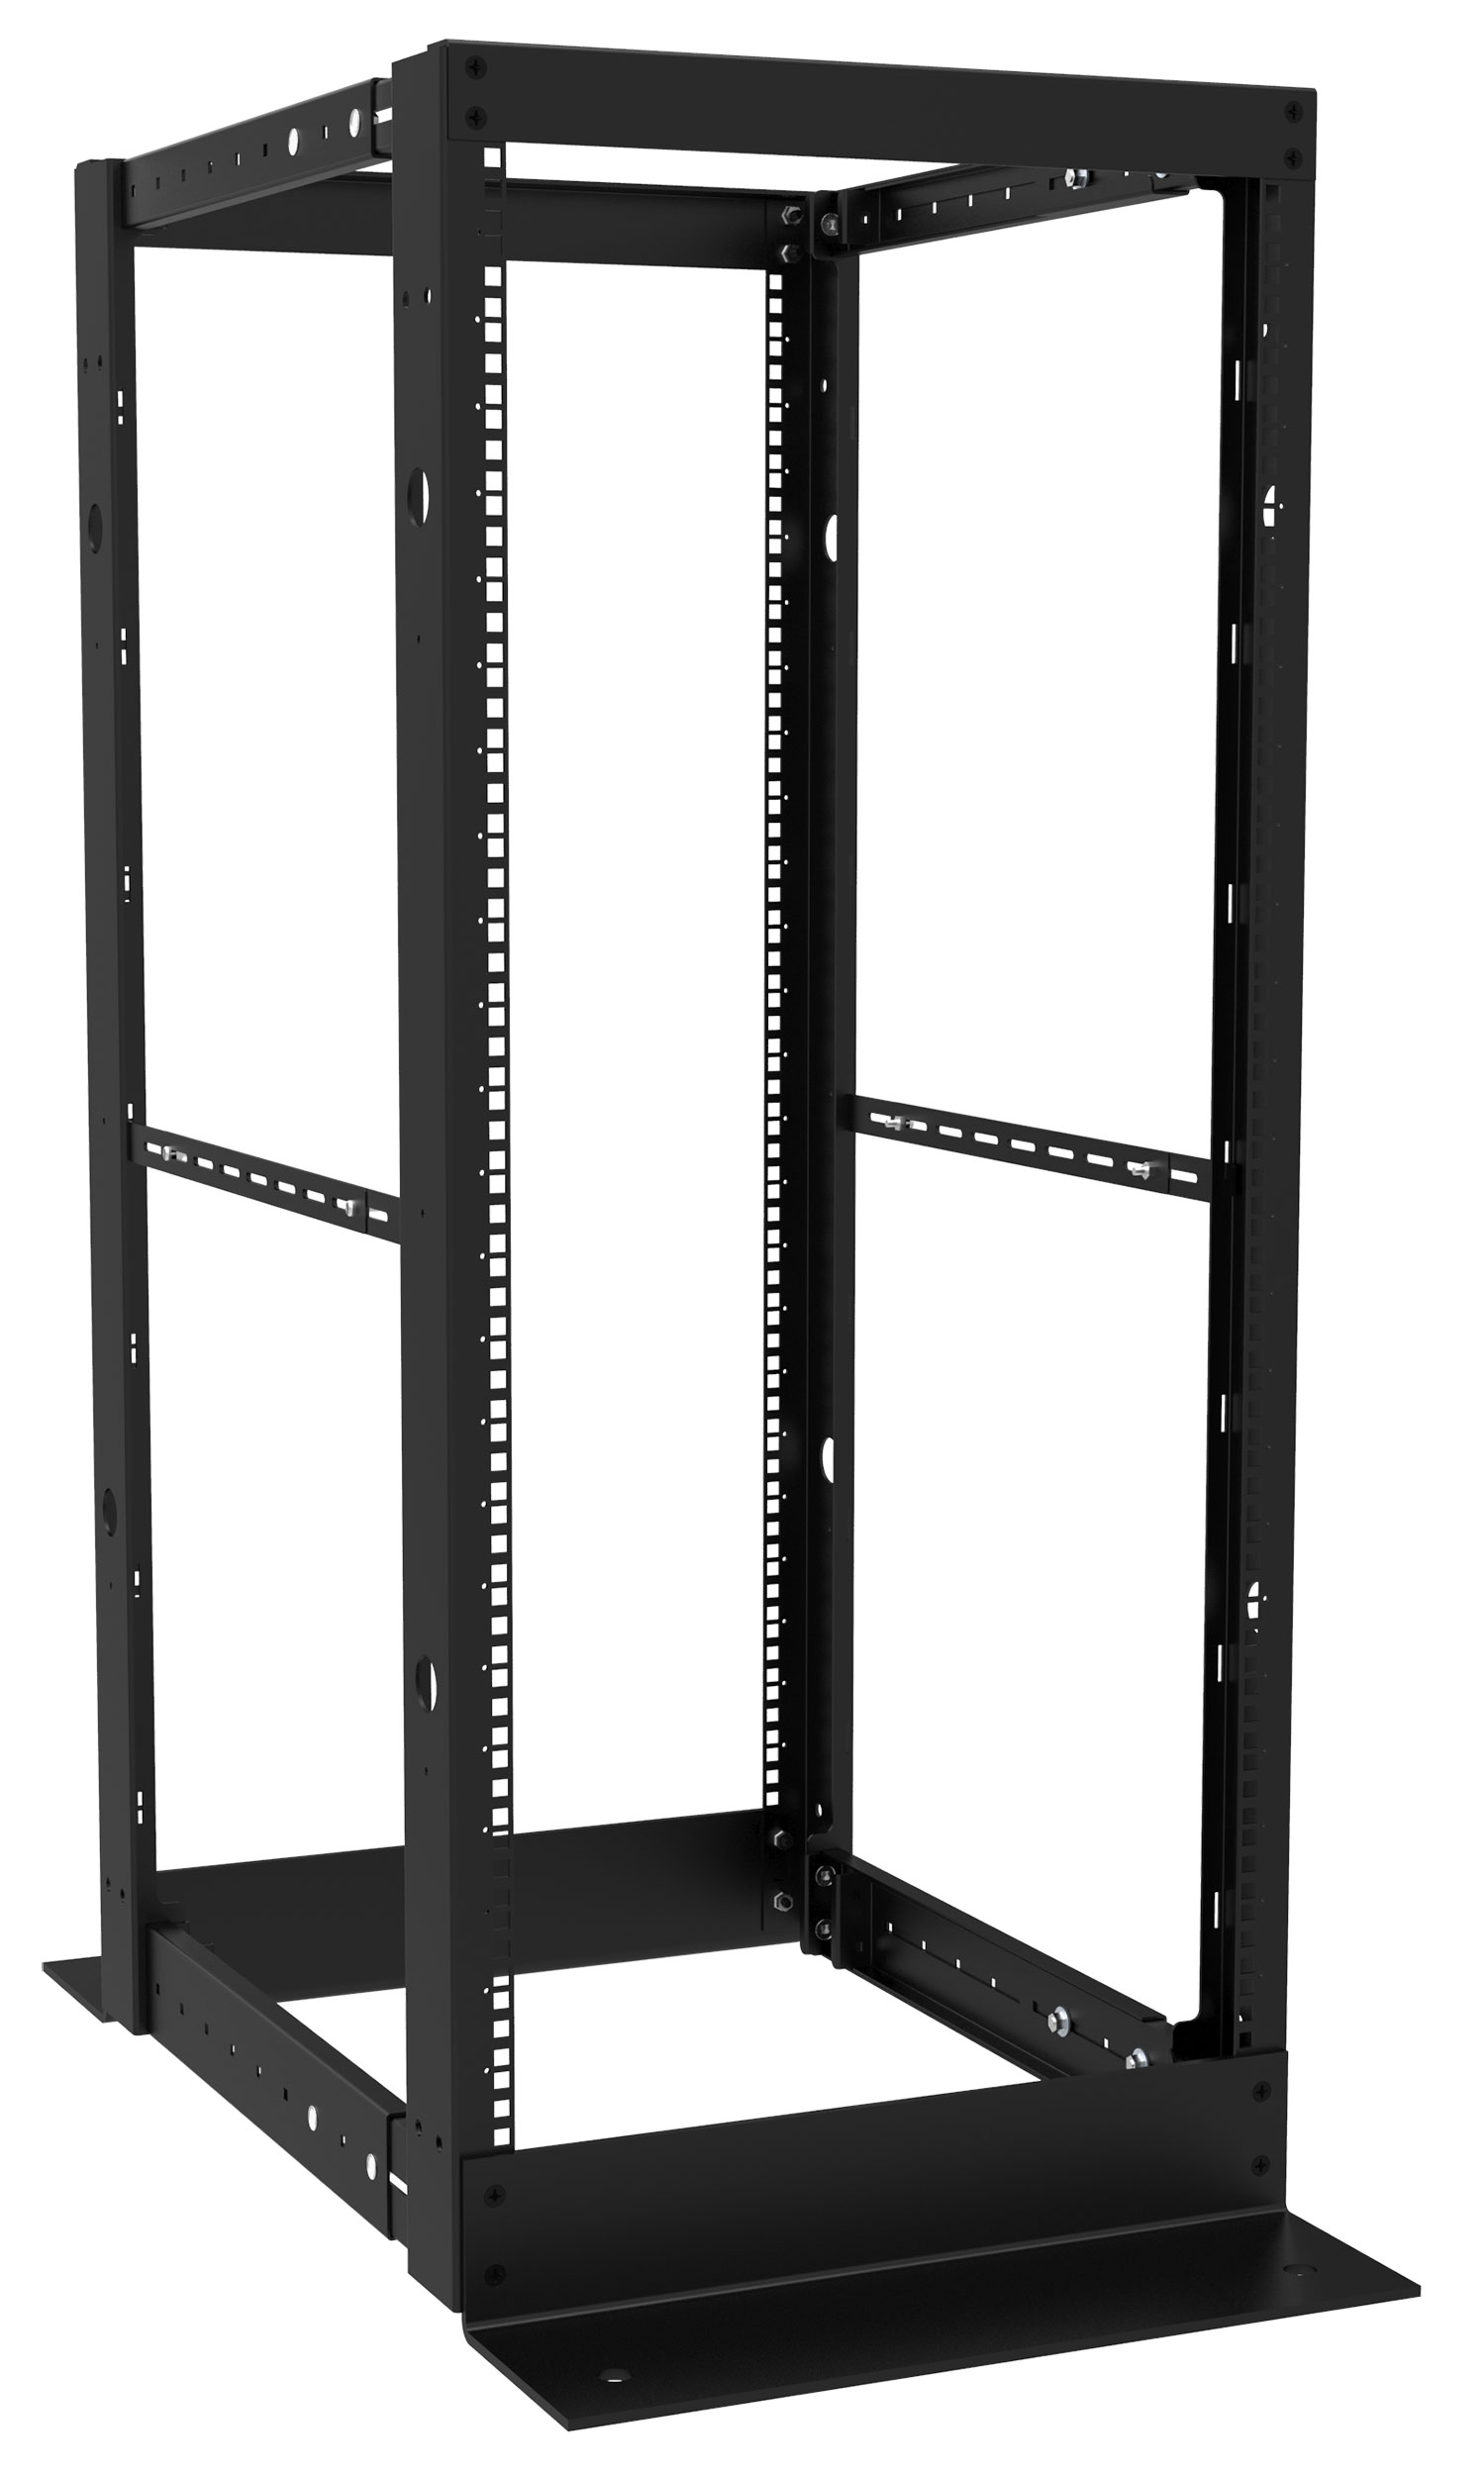 4 post open frame rack dc4r series